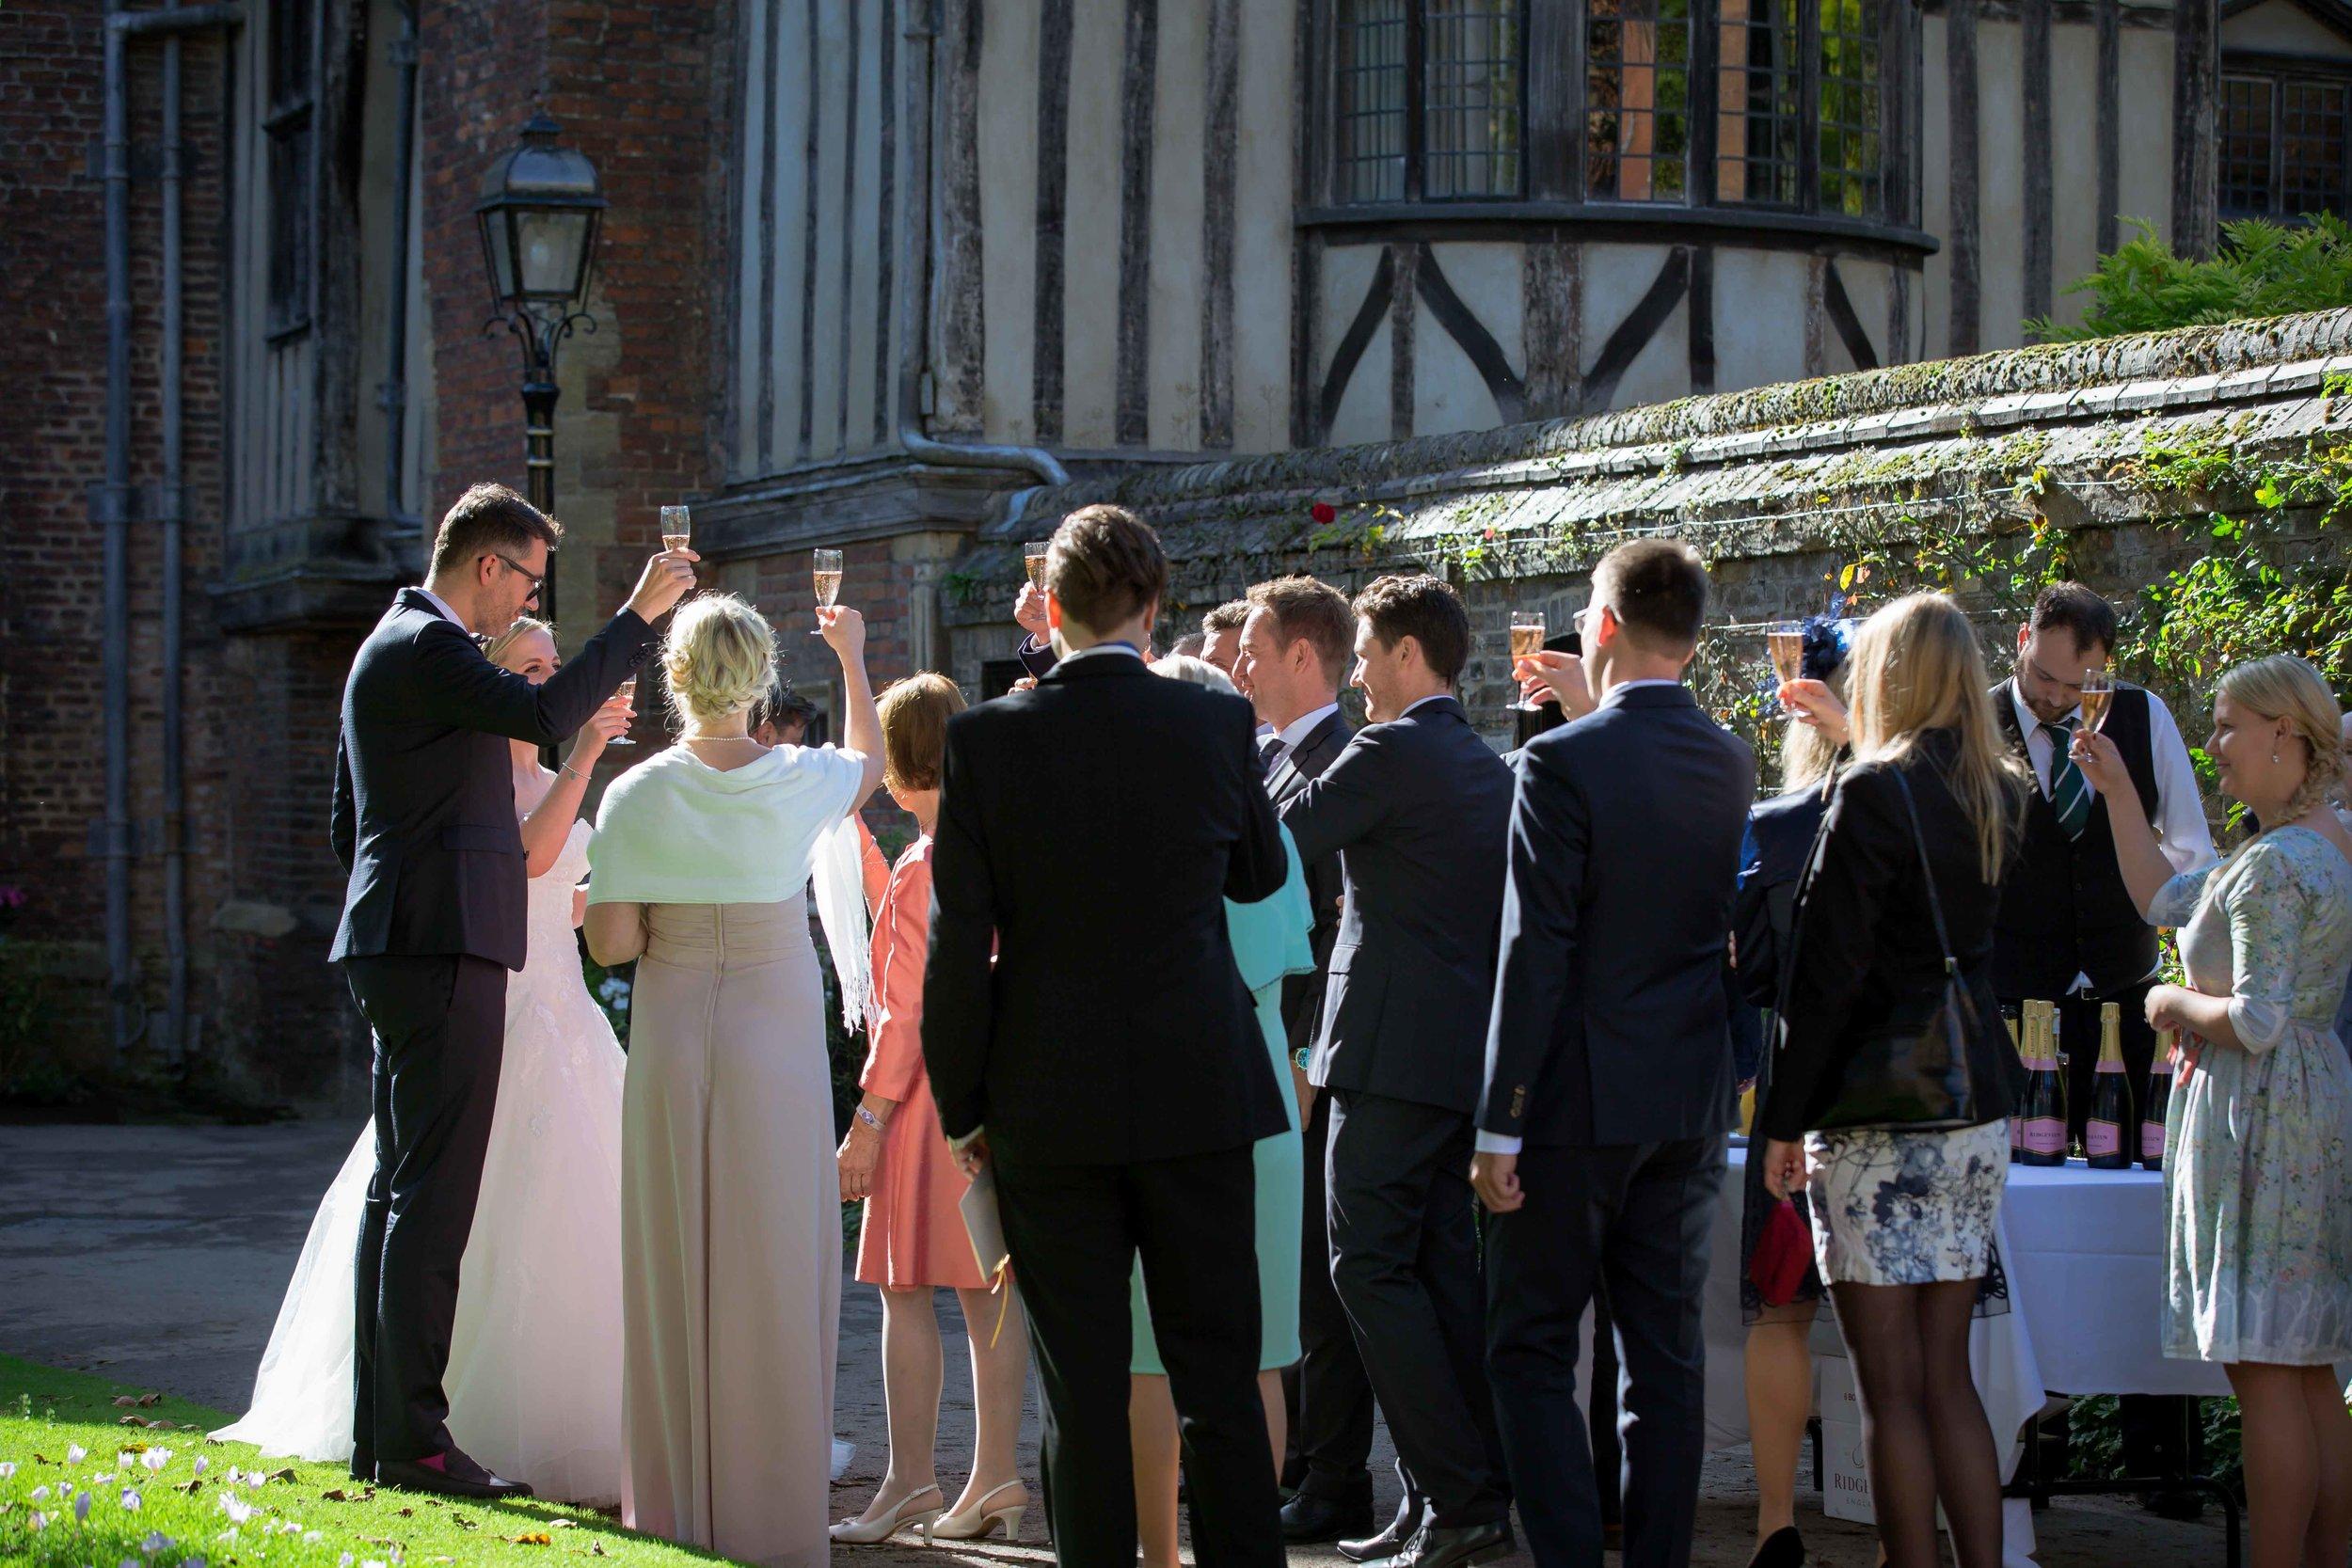 Adrian_Nicole_Charnwood_Weddings_Queens_College_Cambridge-1029.jpg